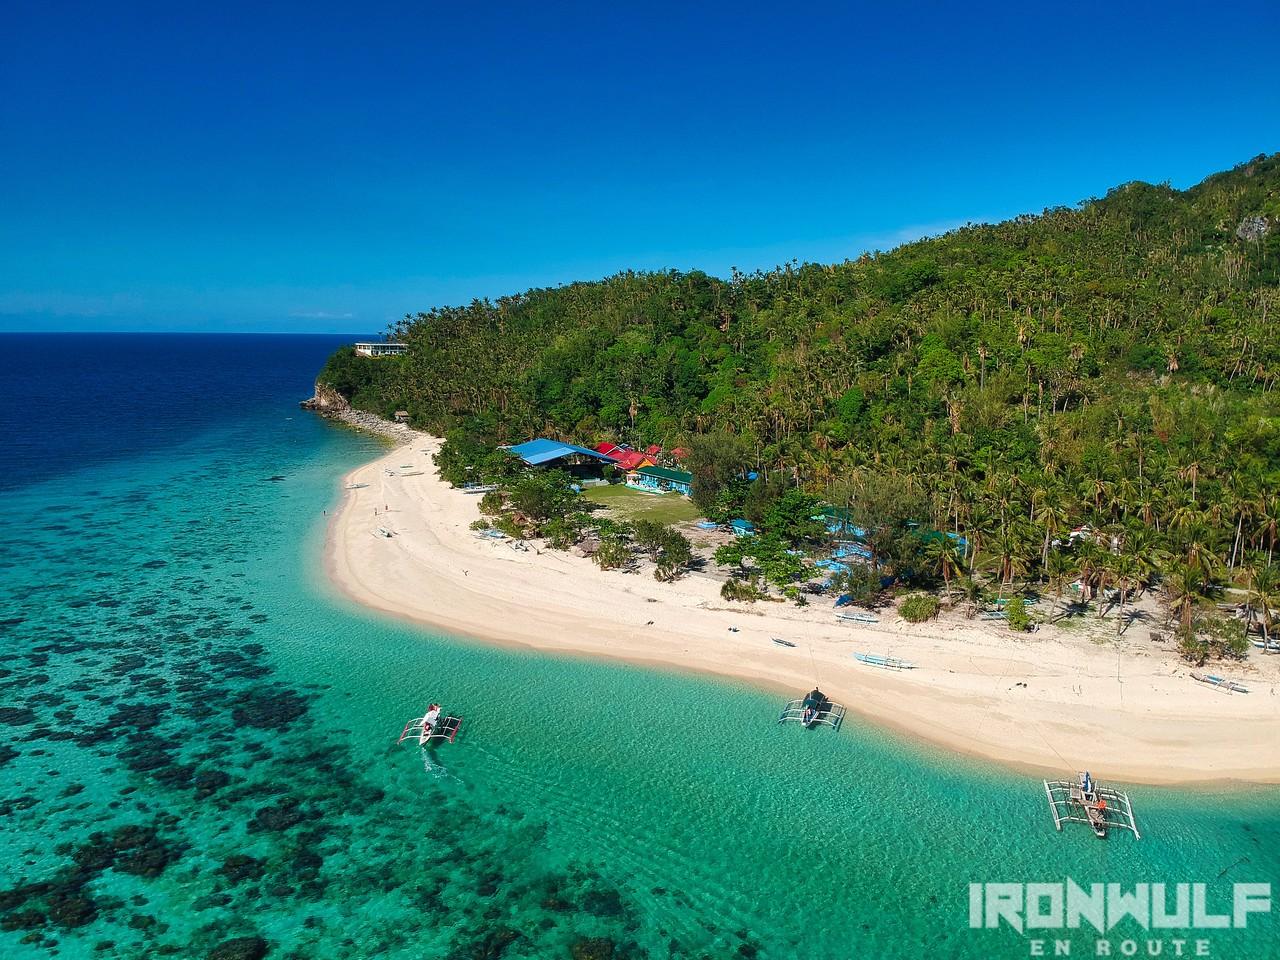 Beach at Sitio Cabugaan